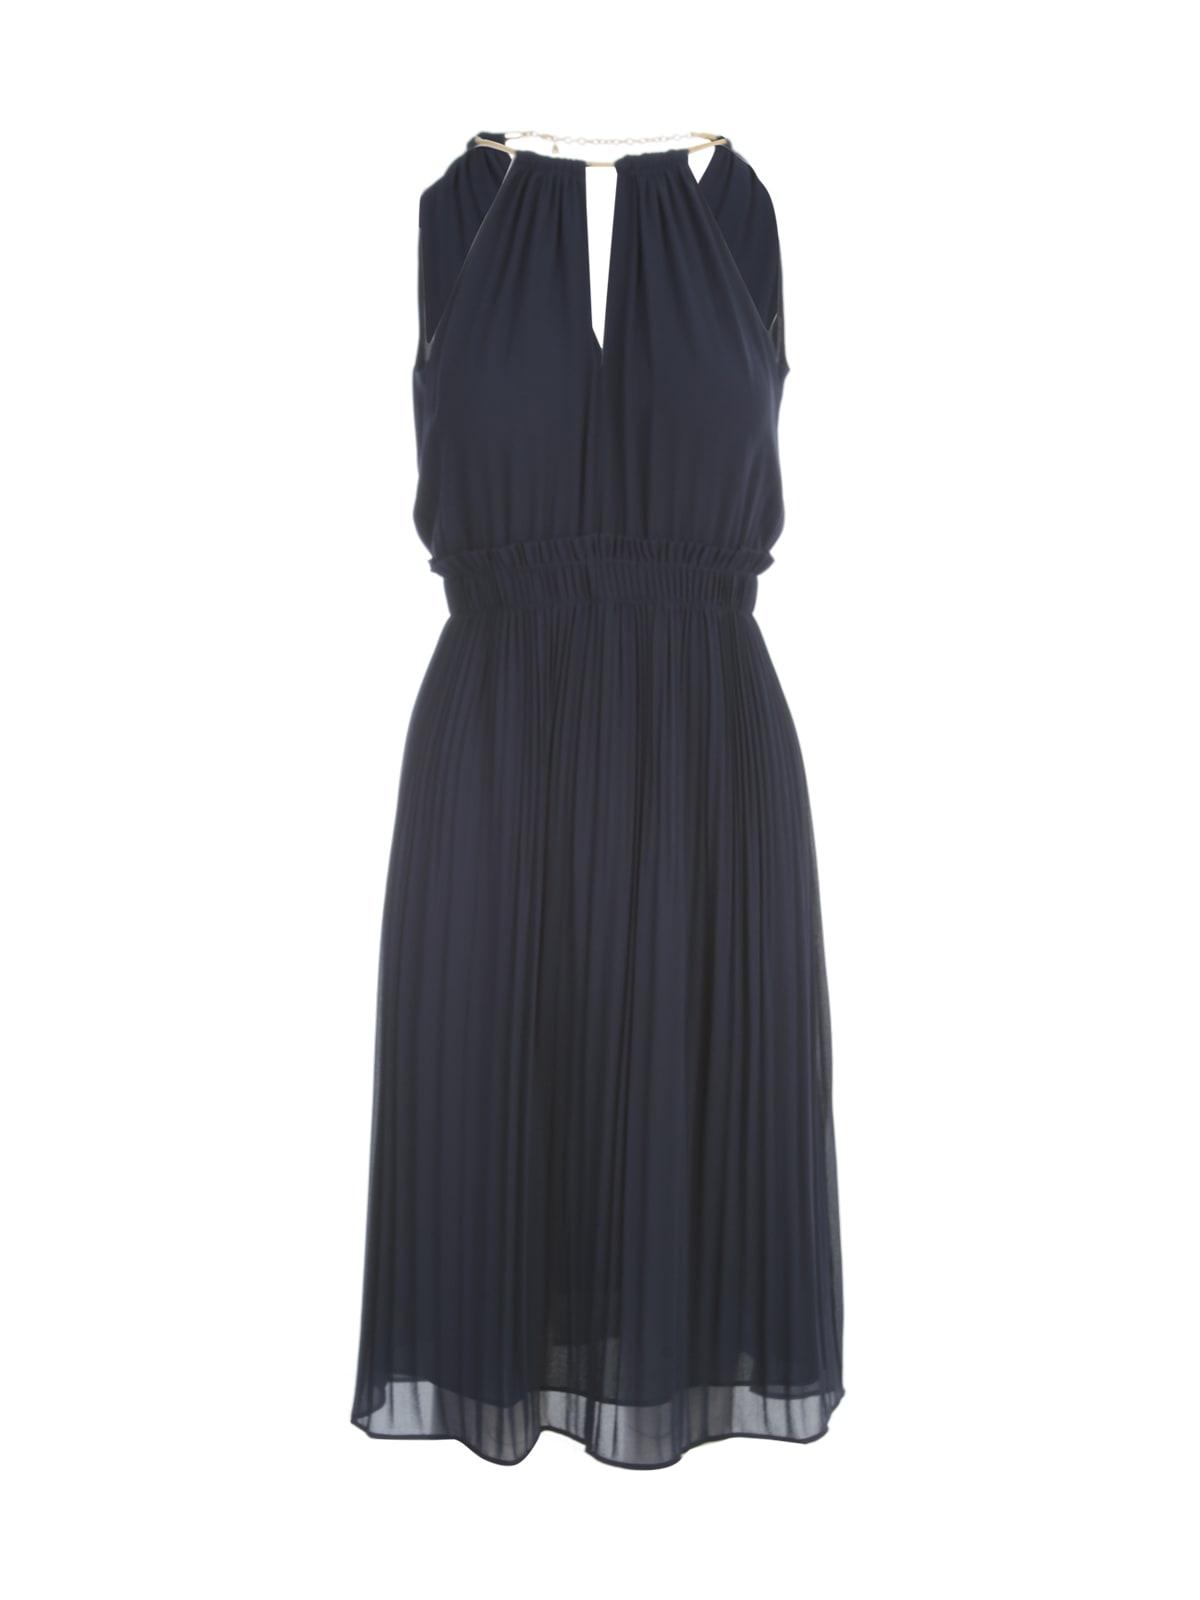 Chain Neck Midi Dress Michael Kors